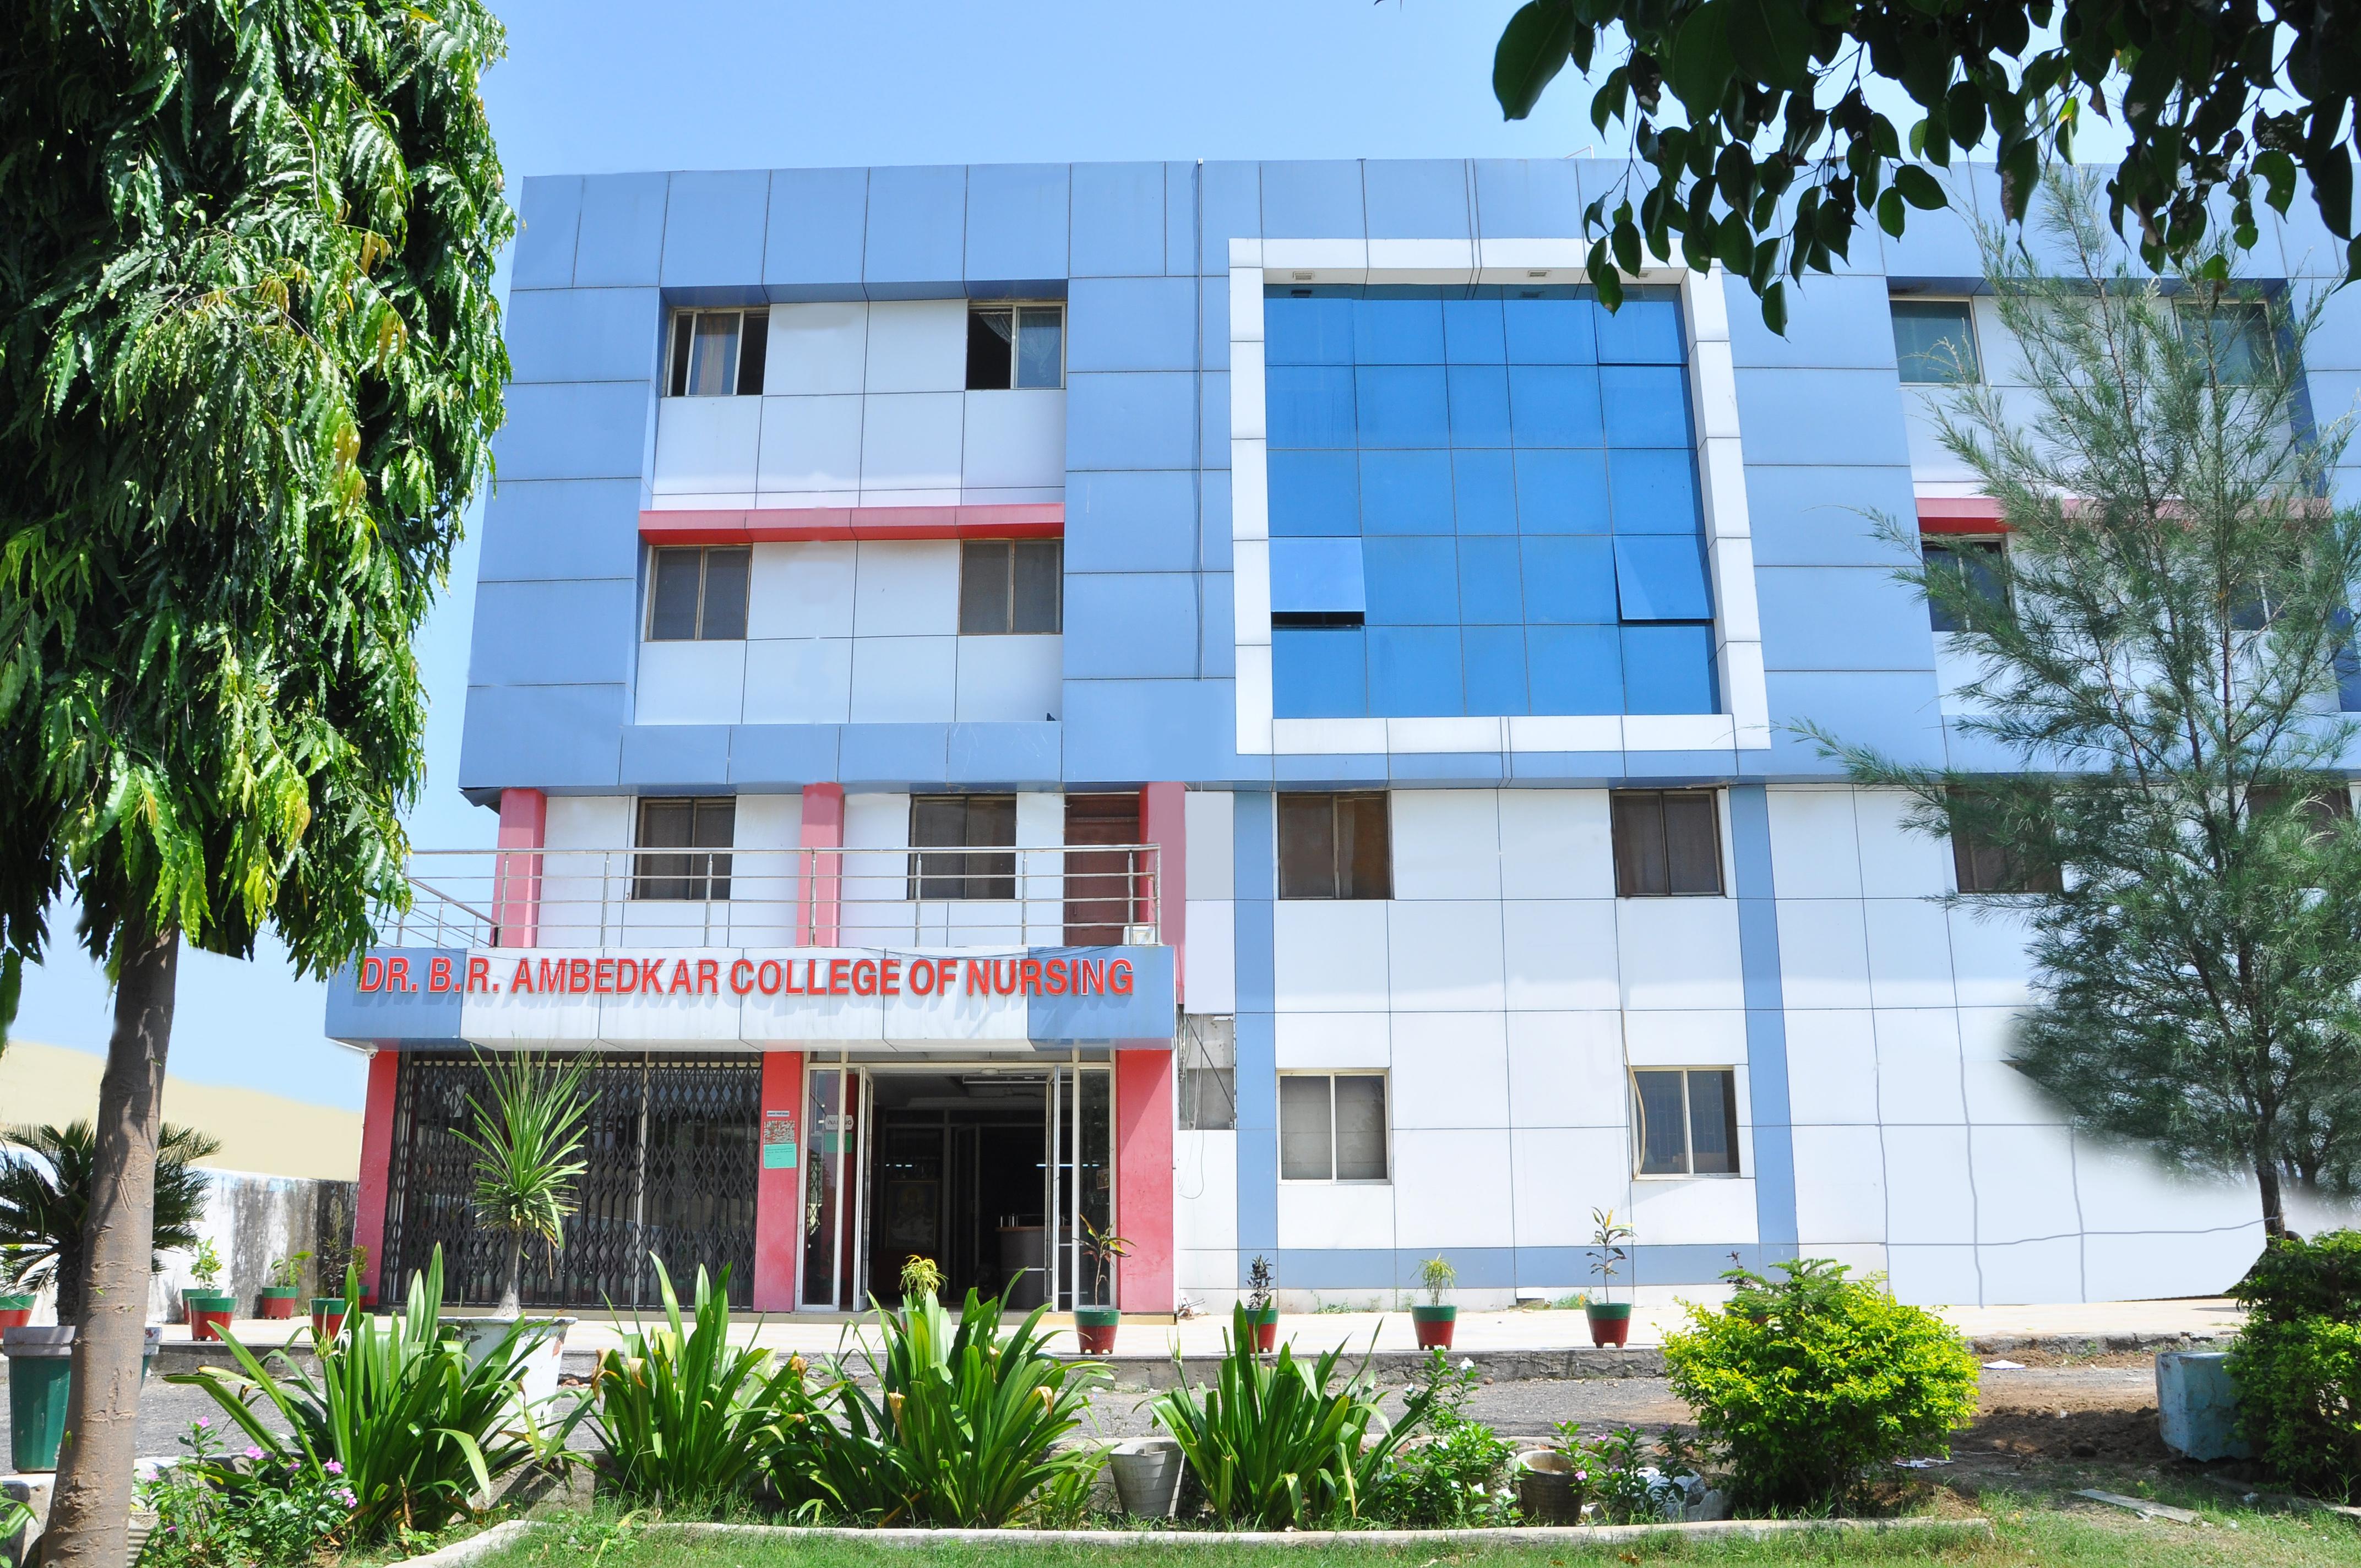 Dr B.R Ambedkar College Of Nursing, Gandhinagar Image